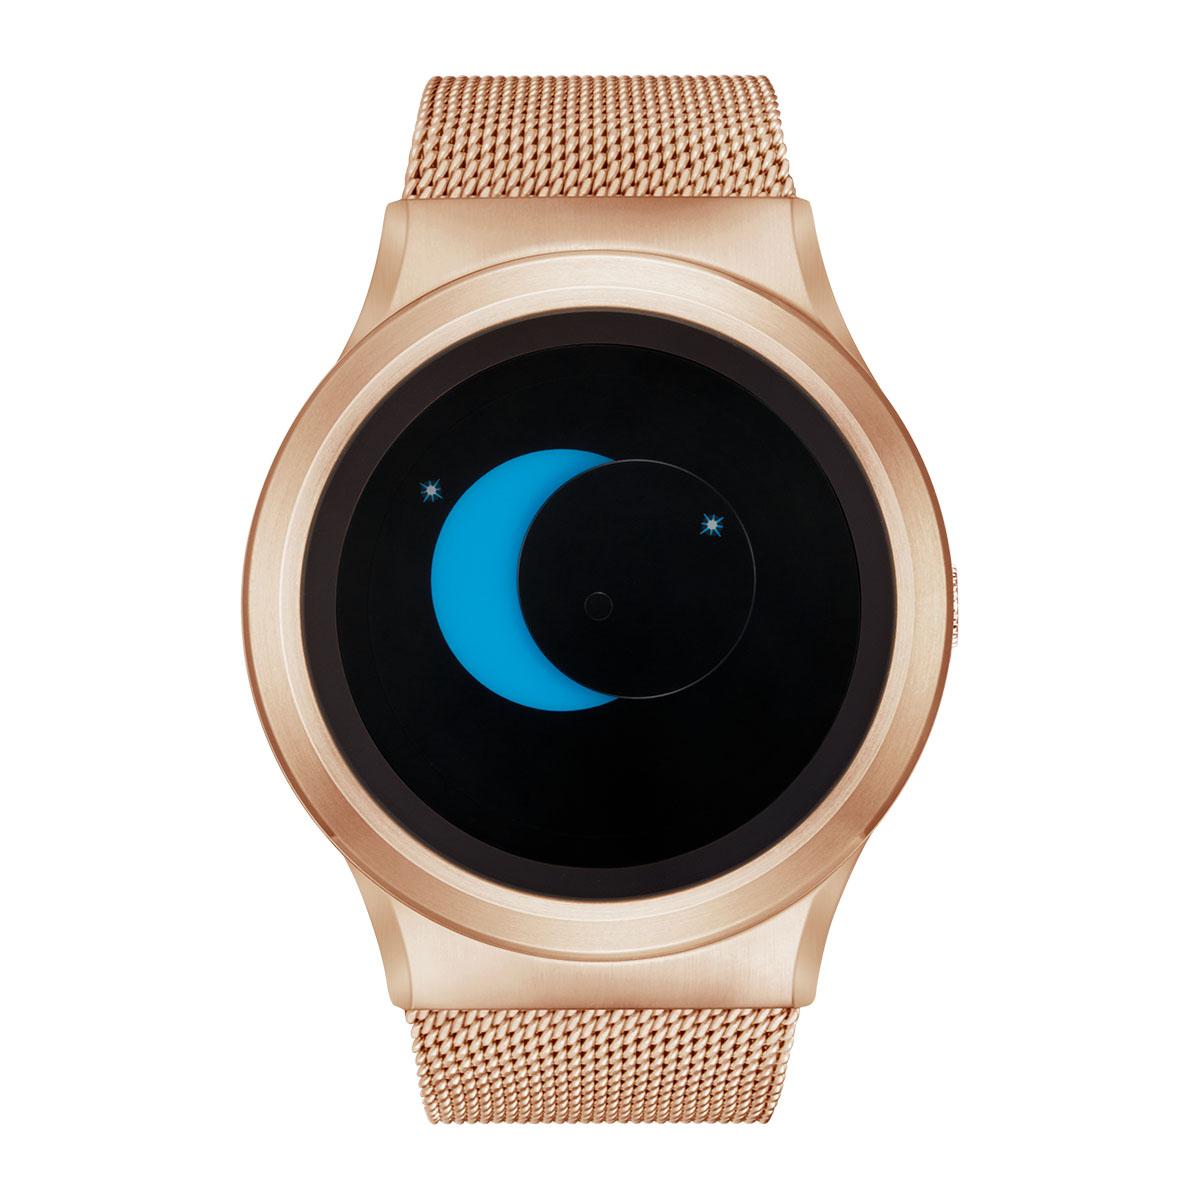 ZEROO SUPER MOON ゼロ 電池式クォーツ 腕時計 [W02006B05SM05] ブルー デザインウォッチ ペア用 メンズ レディース ユニセックス おしゃれ時計 デザイナーズ